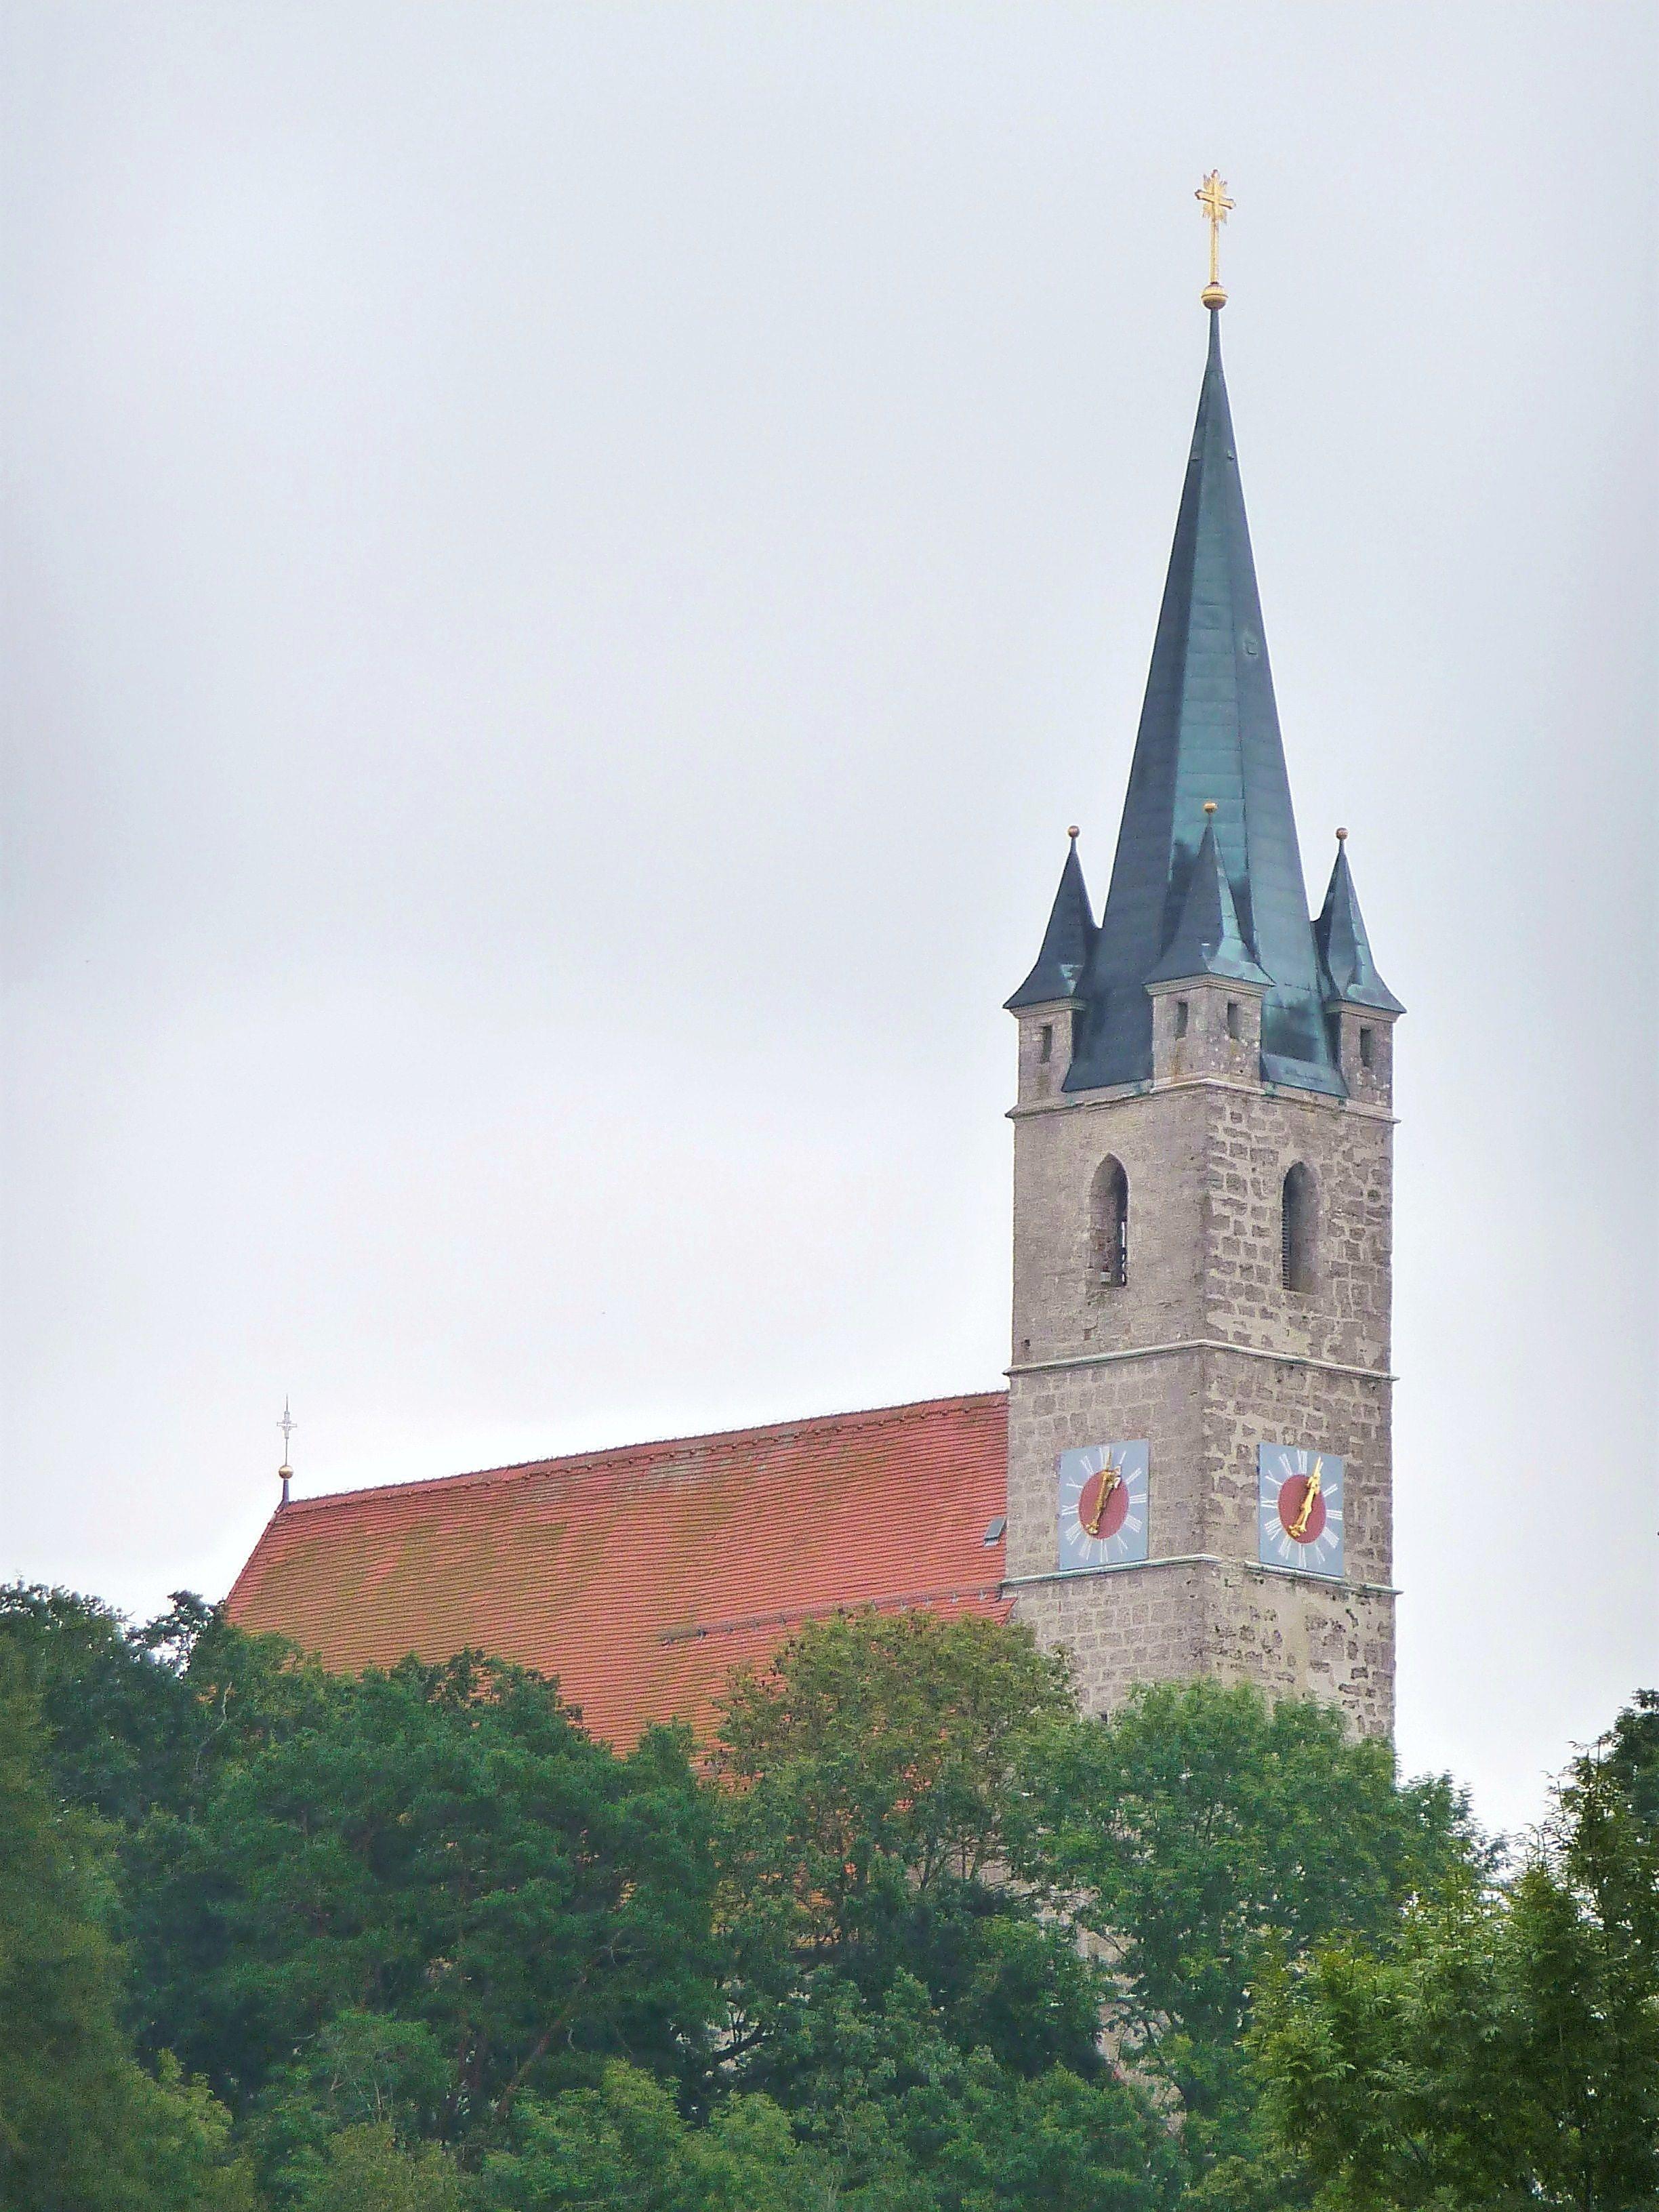 Pfarrkirche St  Rupertus2C Burgkirchen Am Wald